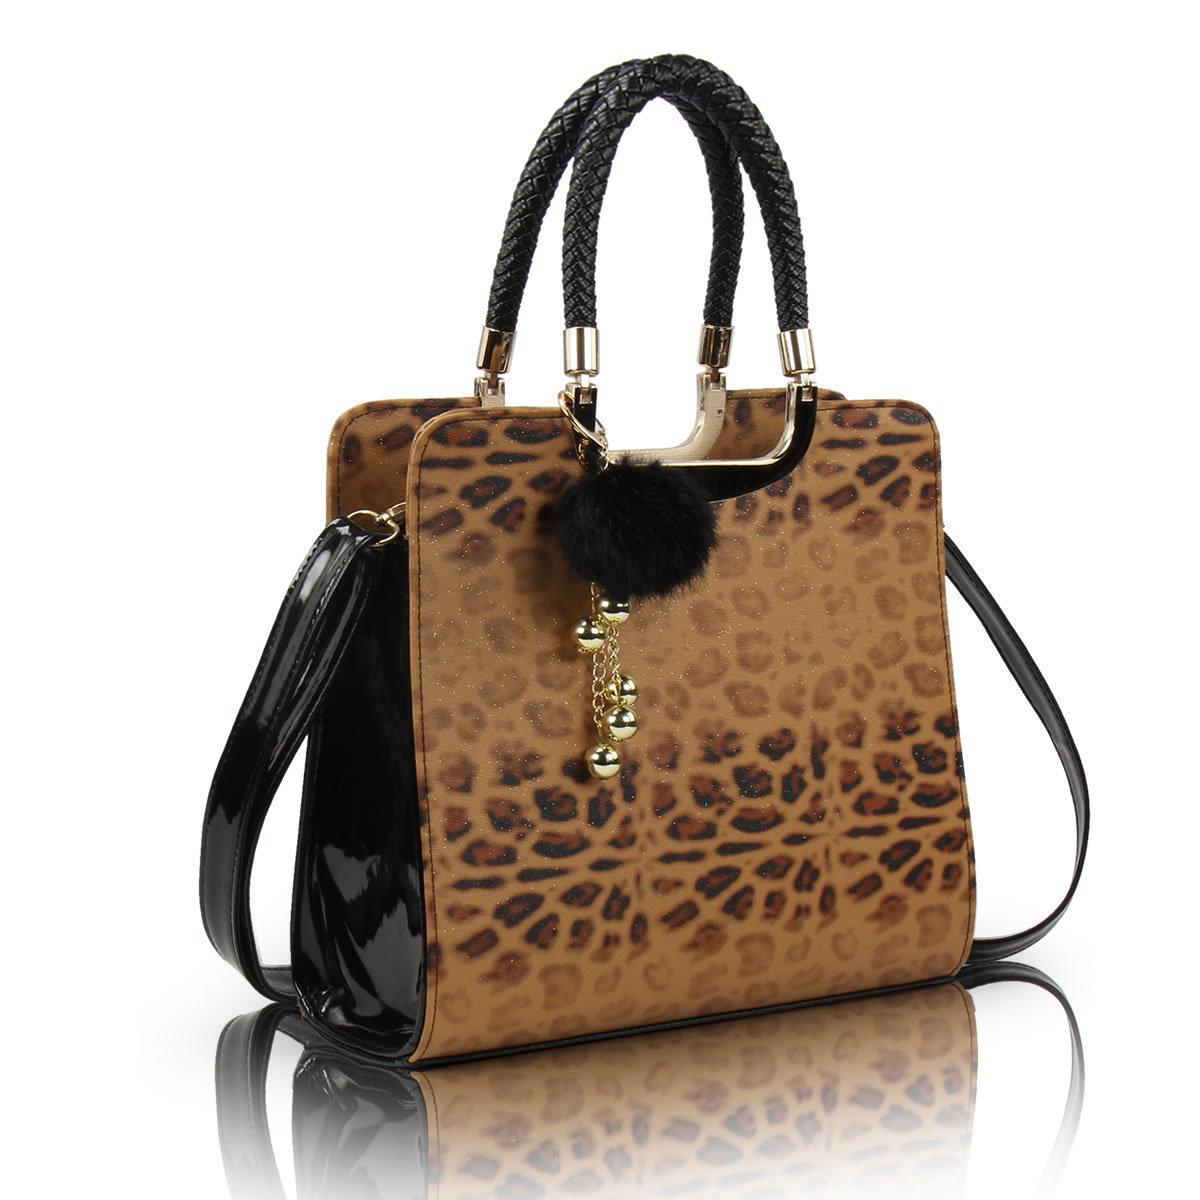 Women's handbag 2013 leopard print bags color block bag women's handbag one shoulder cross-body dual-use package